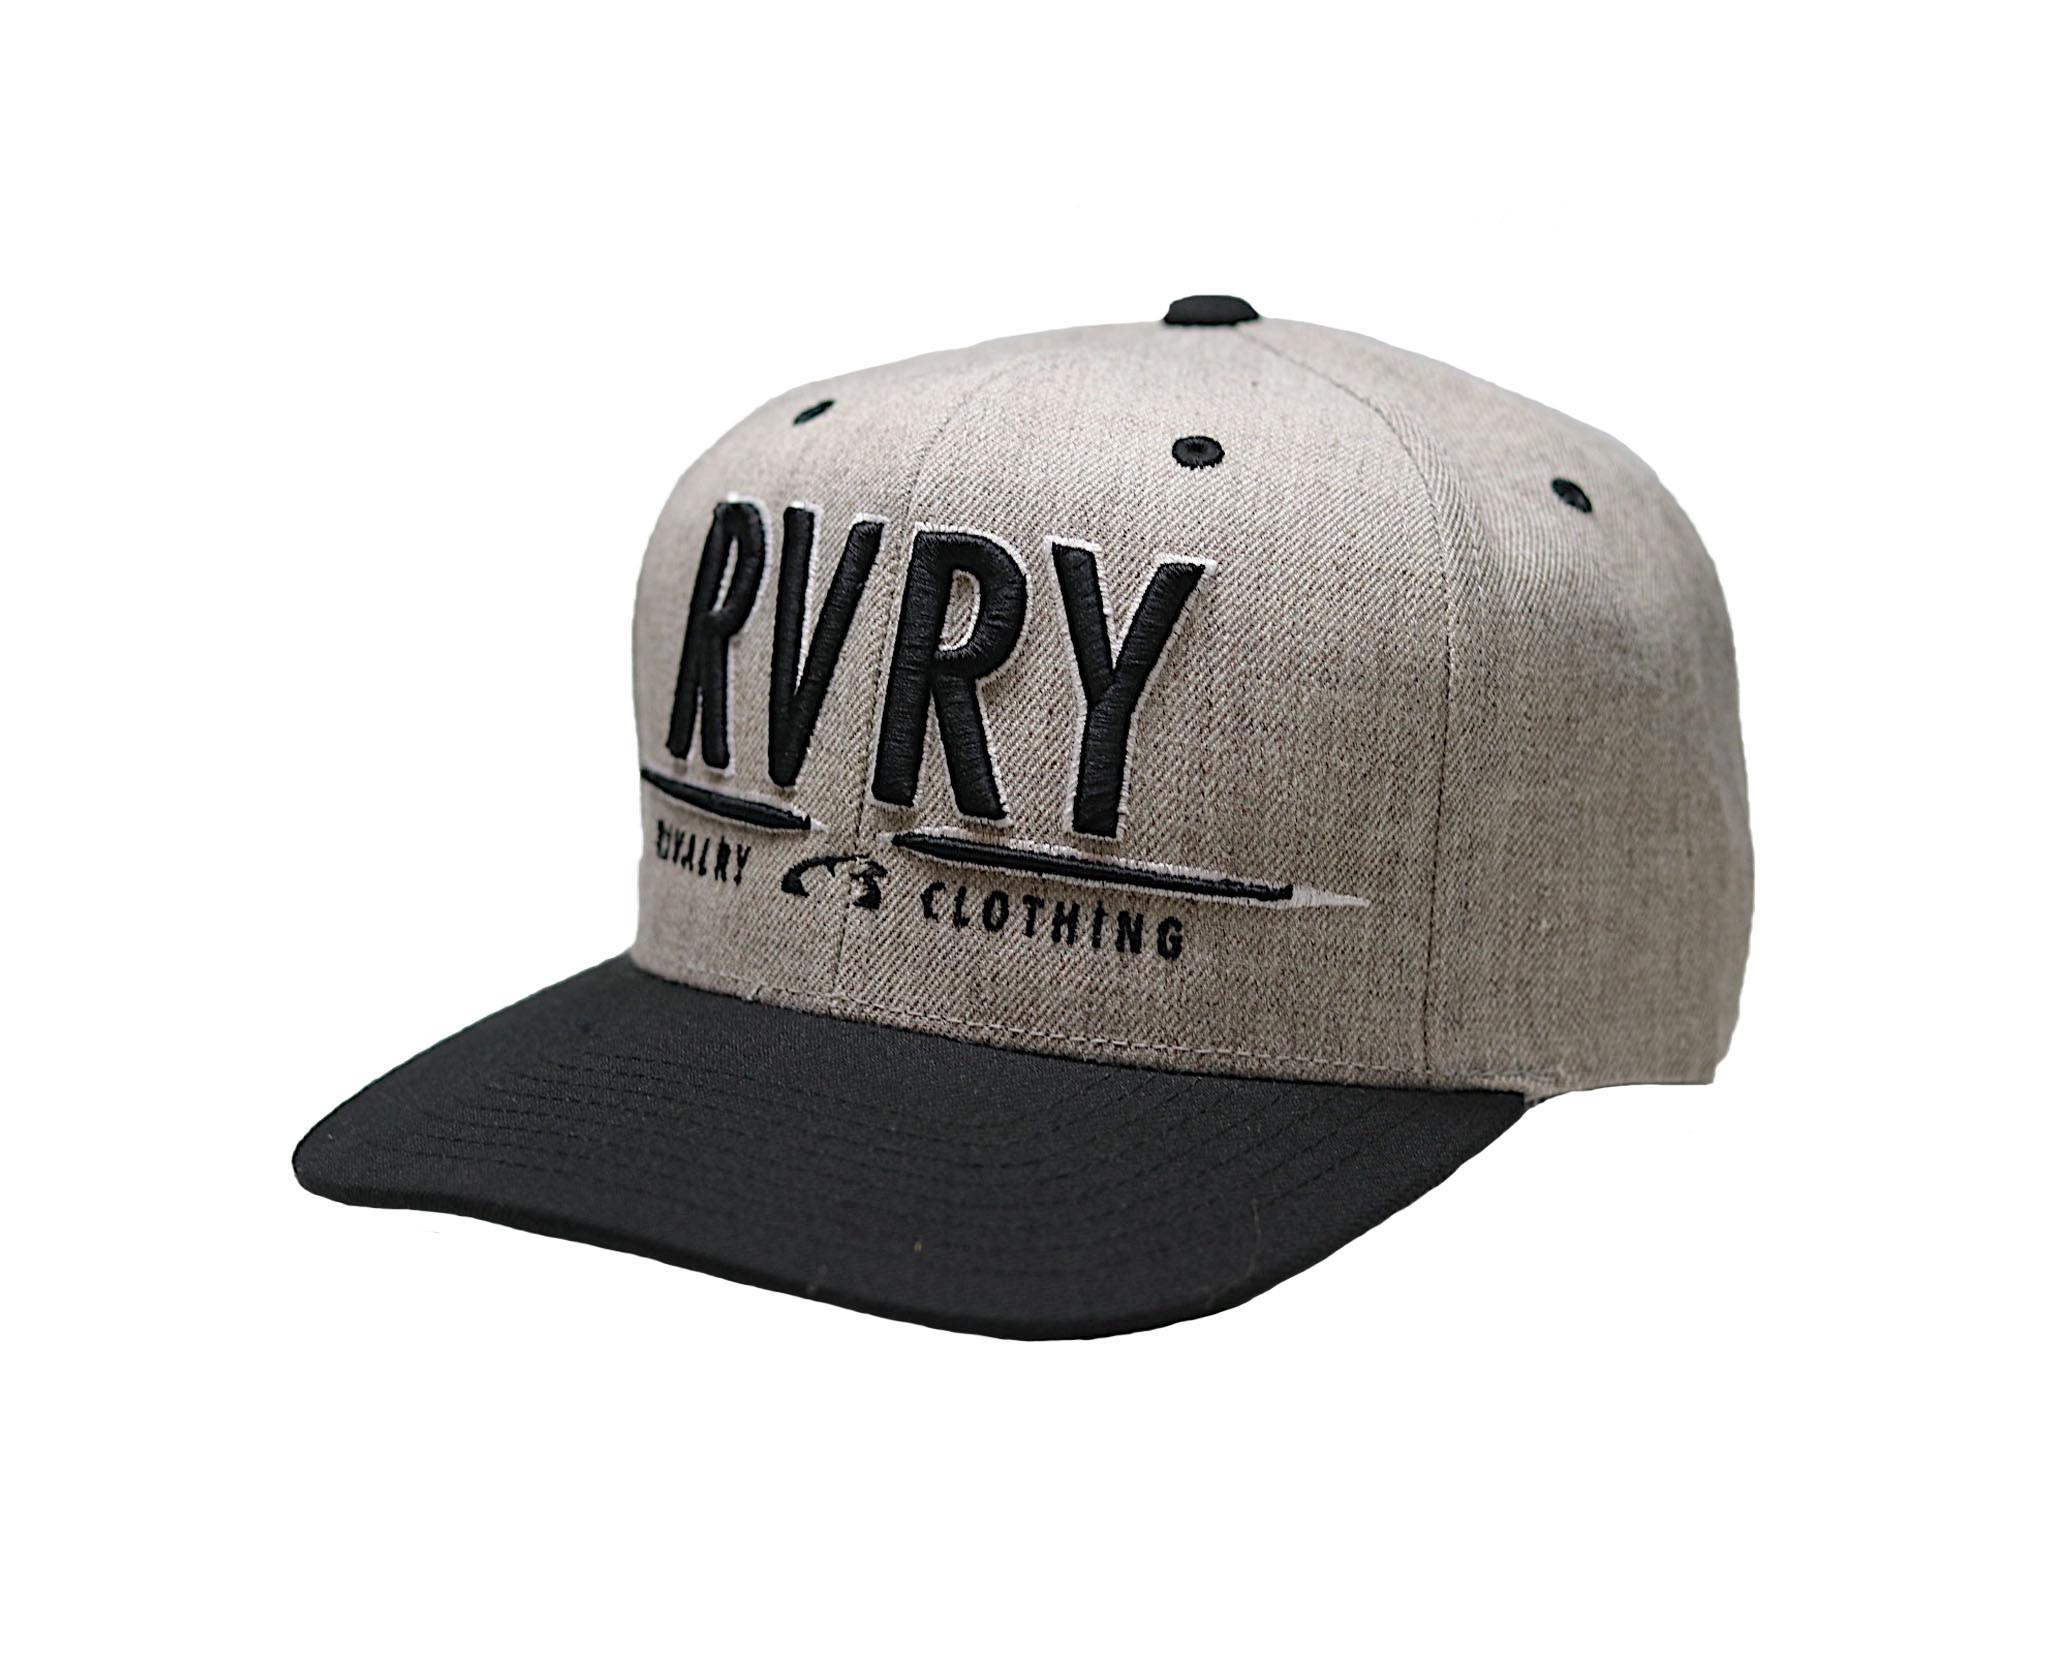 RVRY Aviation SnapBack